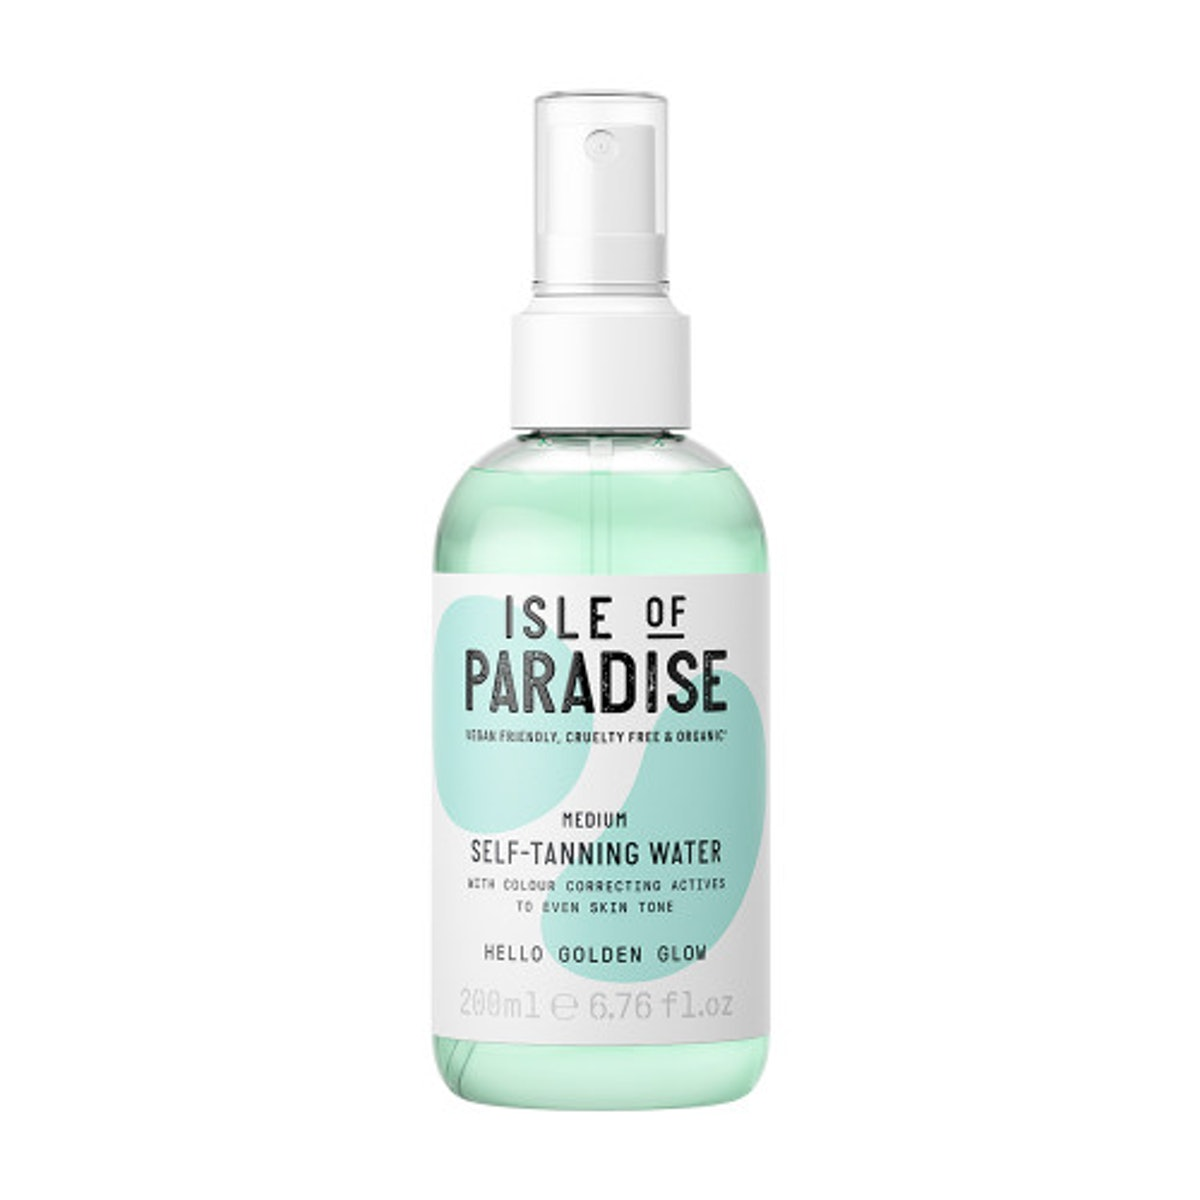 Isle of Paradise Medium Self-Tanning Water